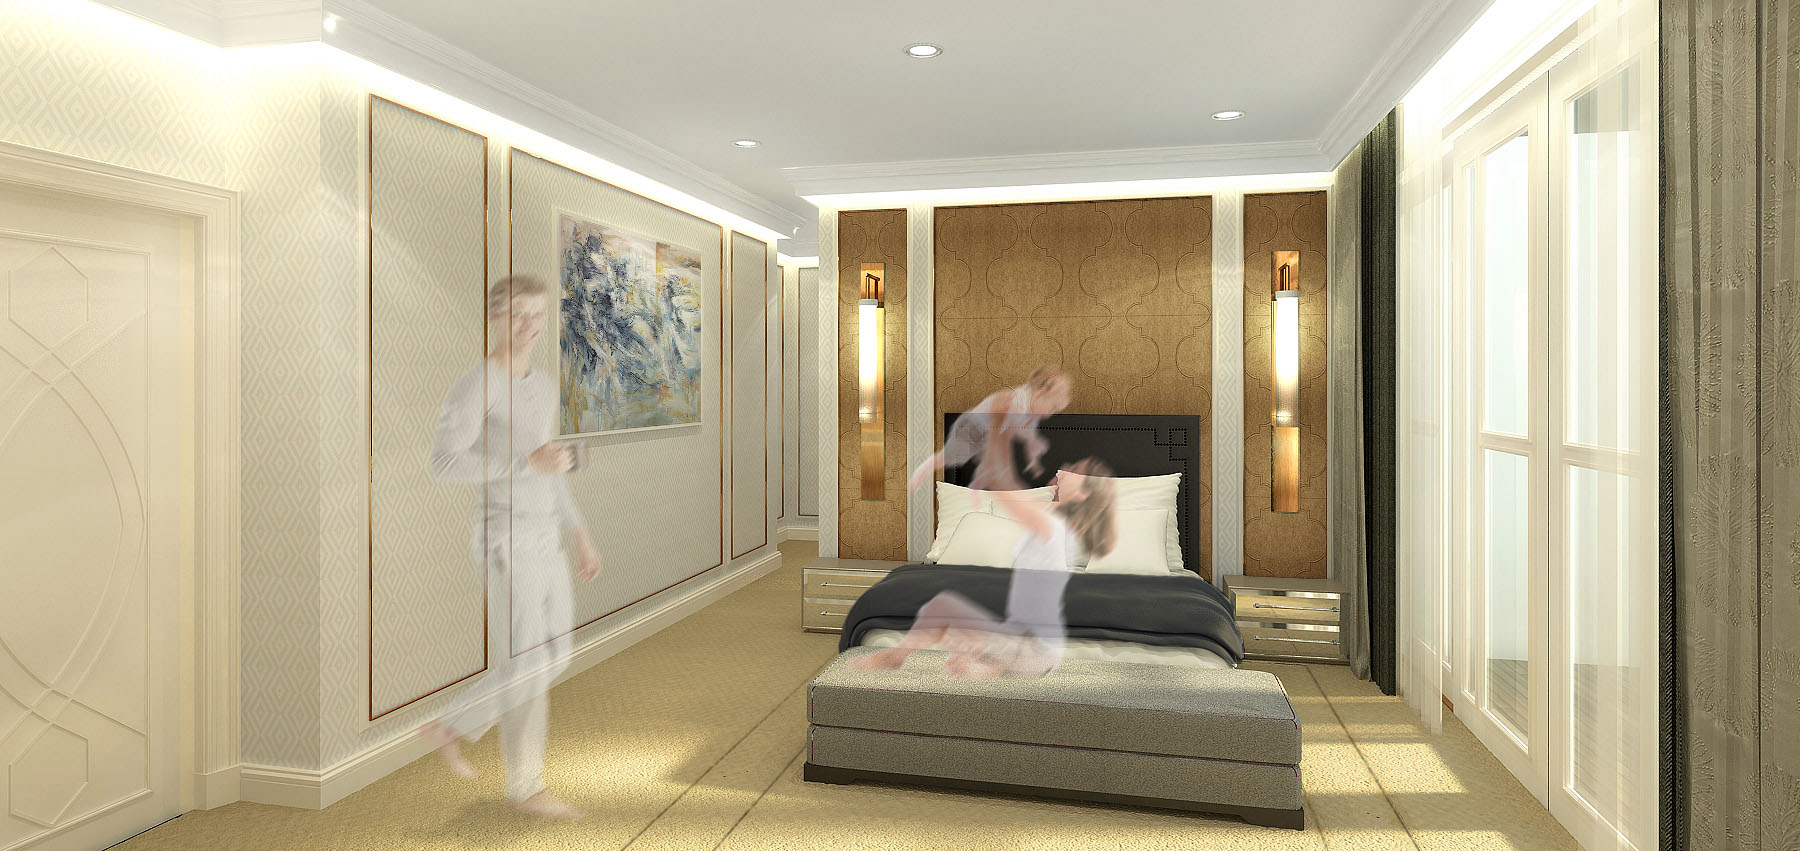 Penthouse - BEDROOM 3